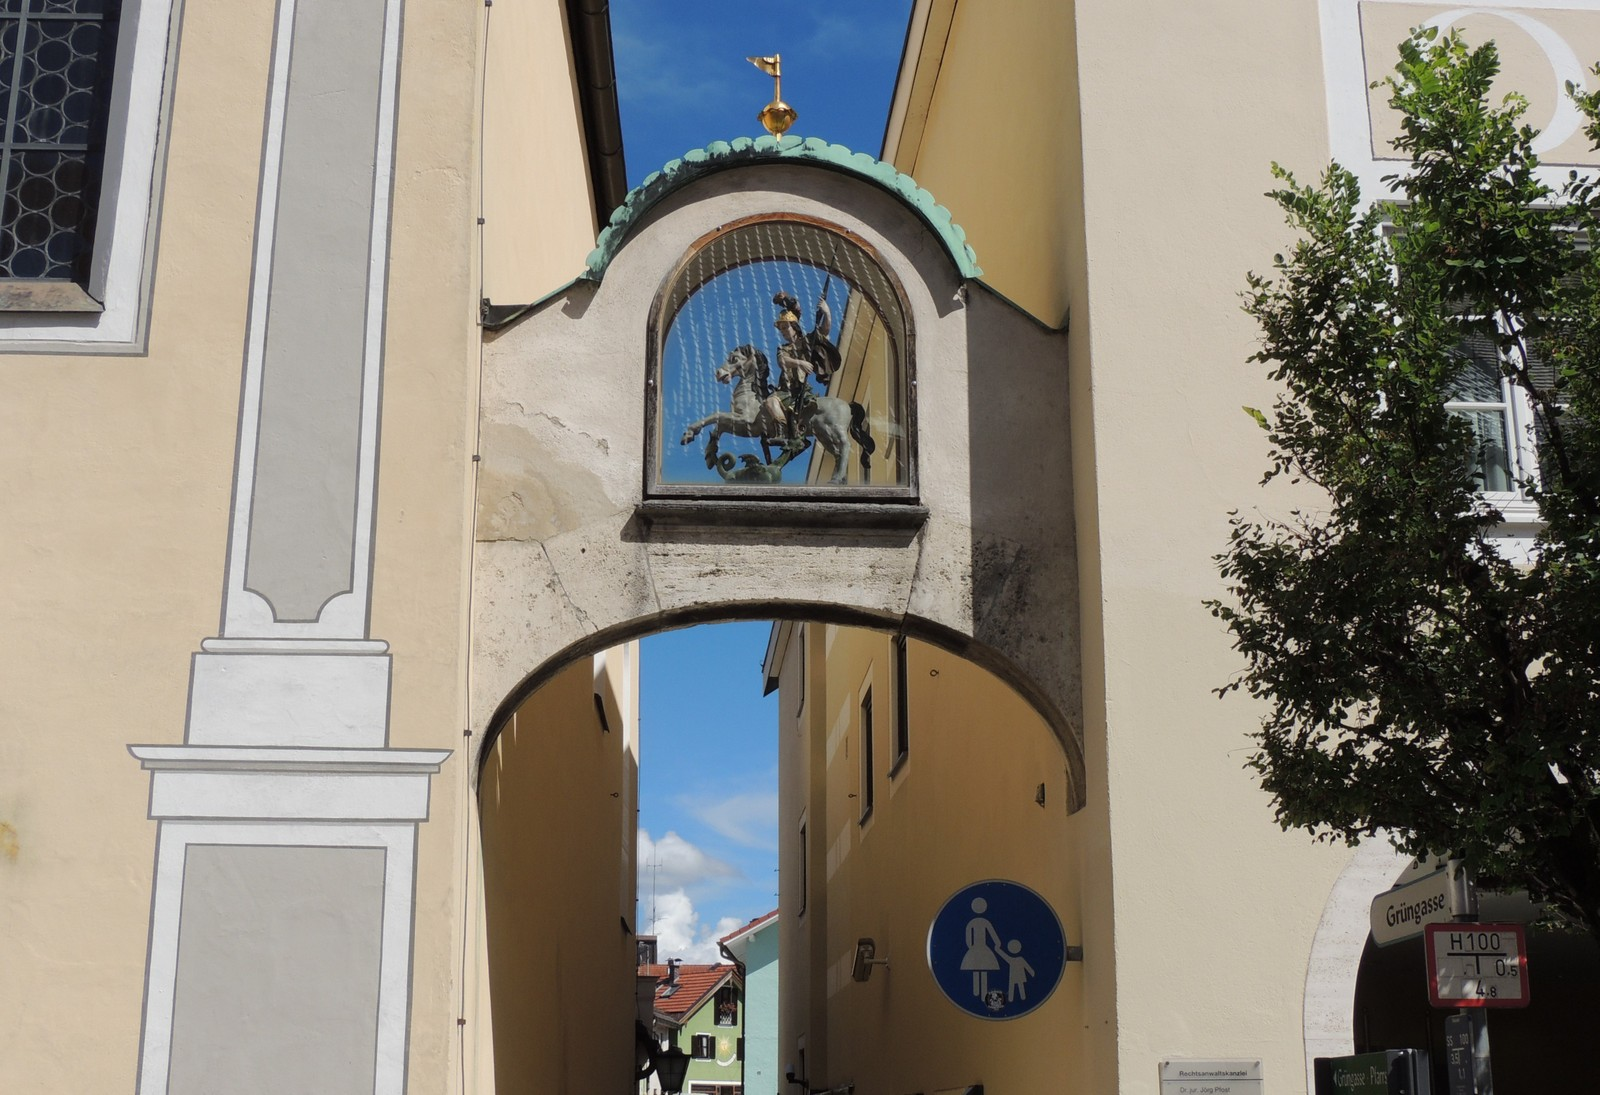 Das Blaue Land - Grüngasse in Murnau